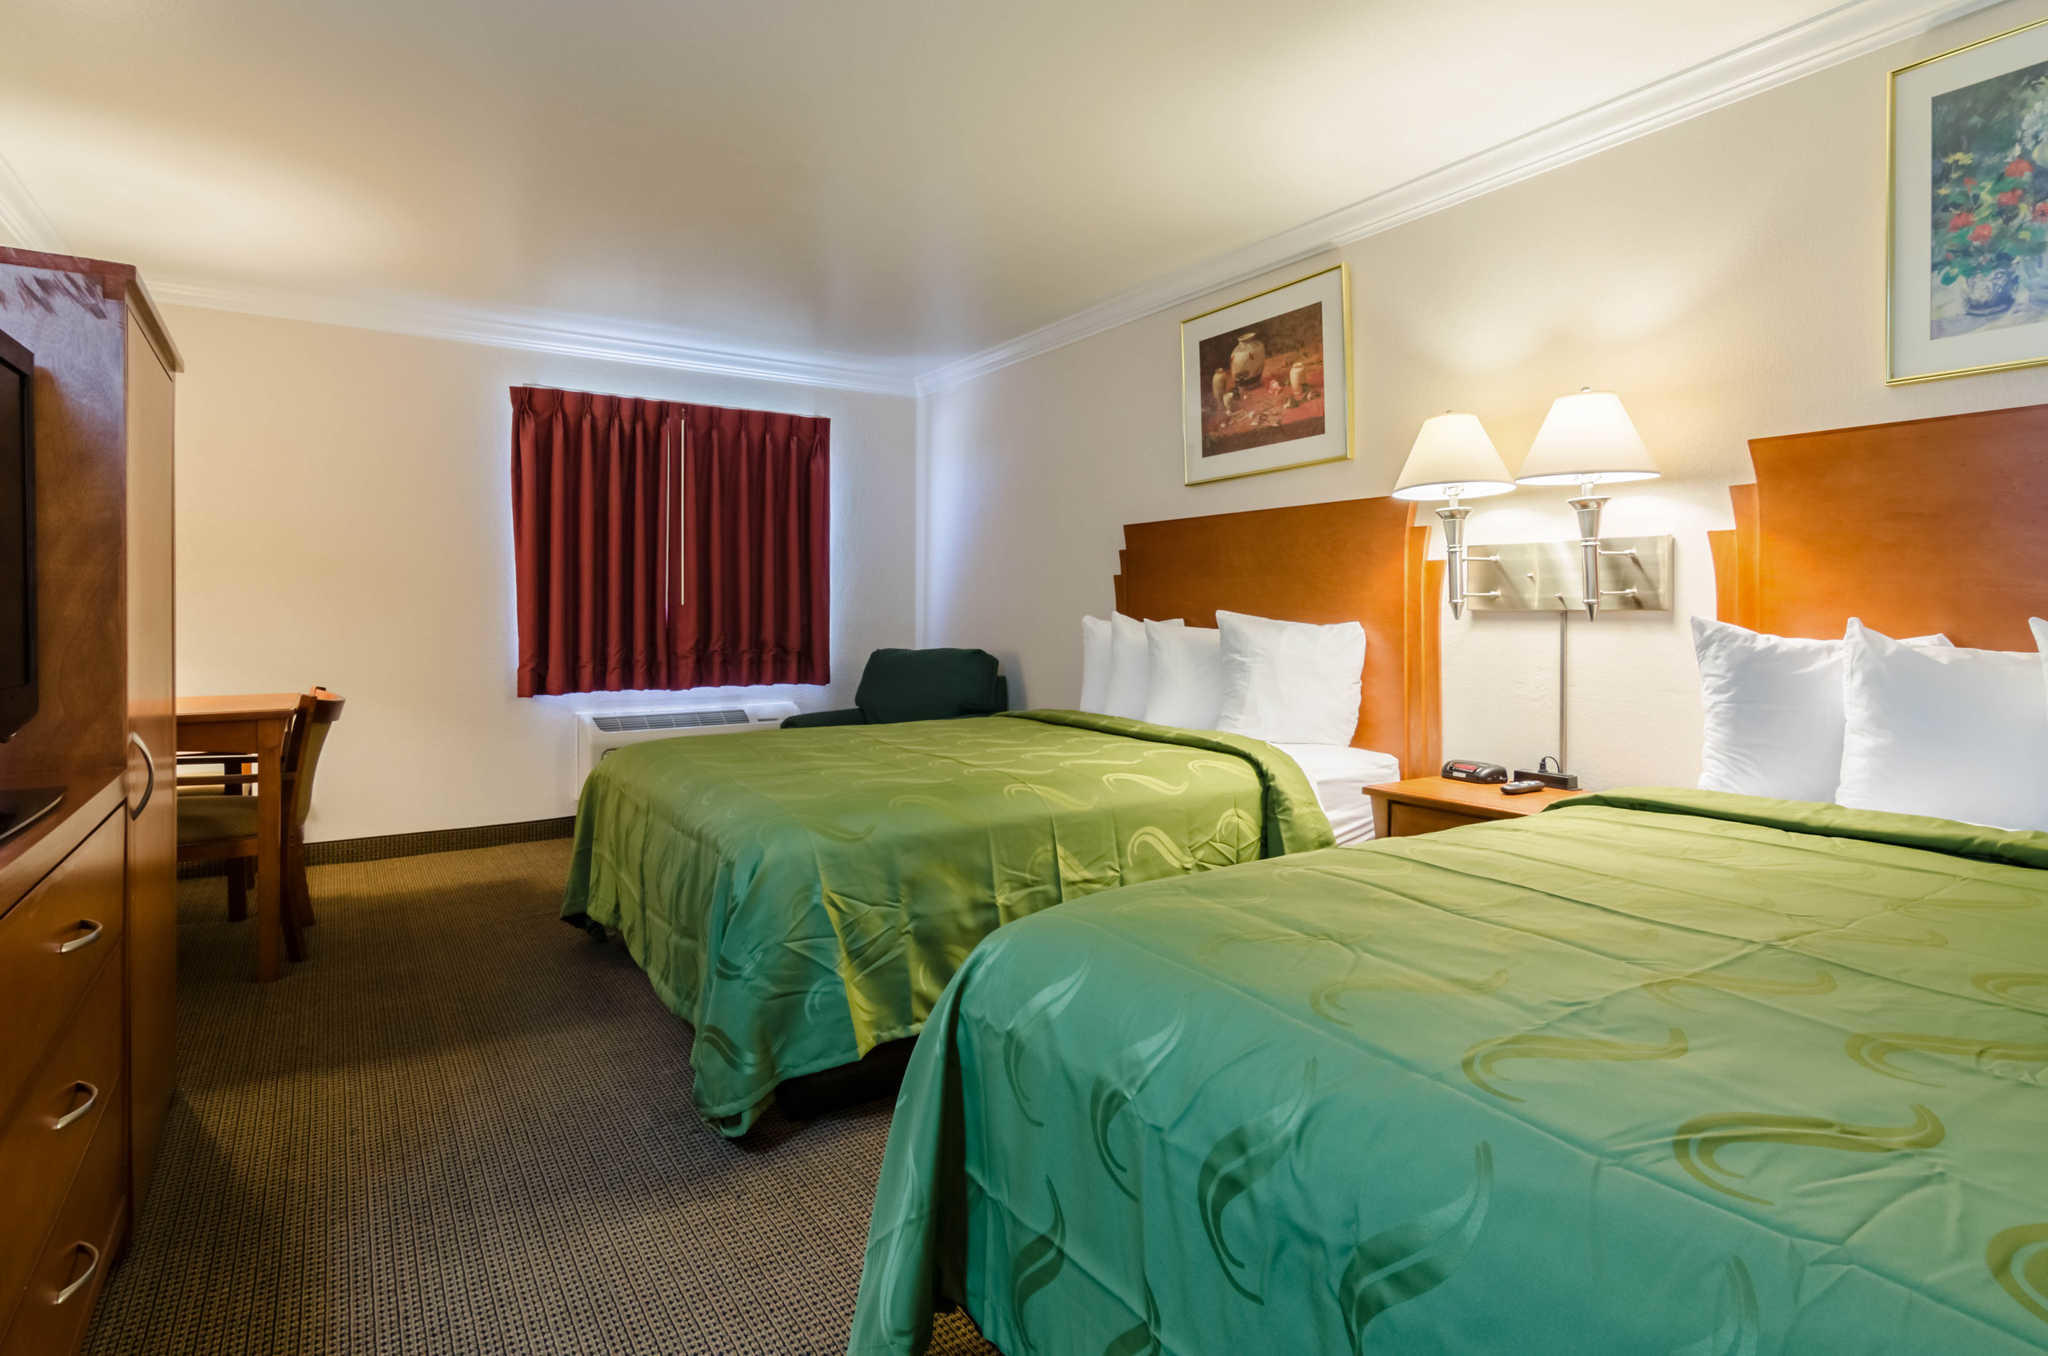 Quality Inn & Suites image 45